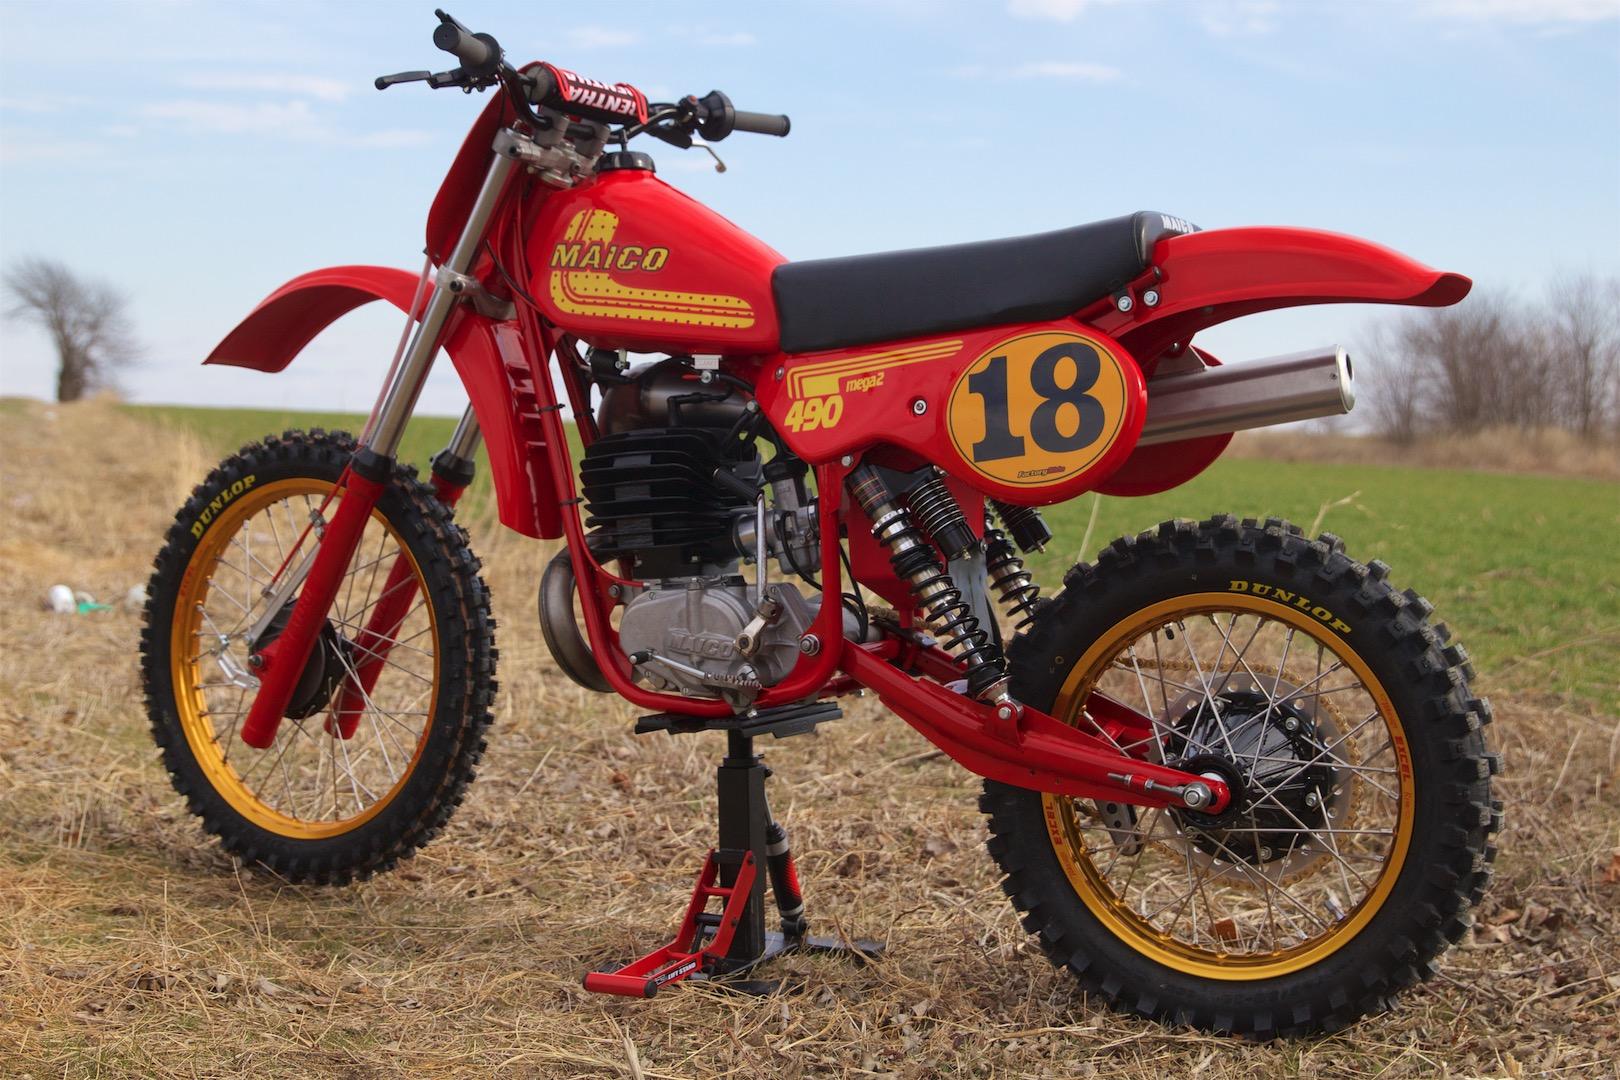 1981-Maico-490-Mega-2-vintage-motocross-motorcycle-3.jpg